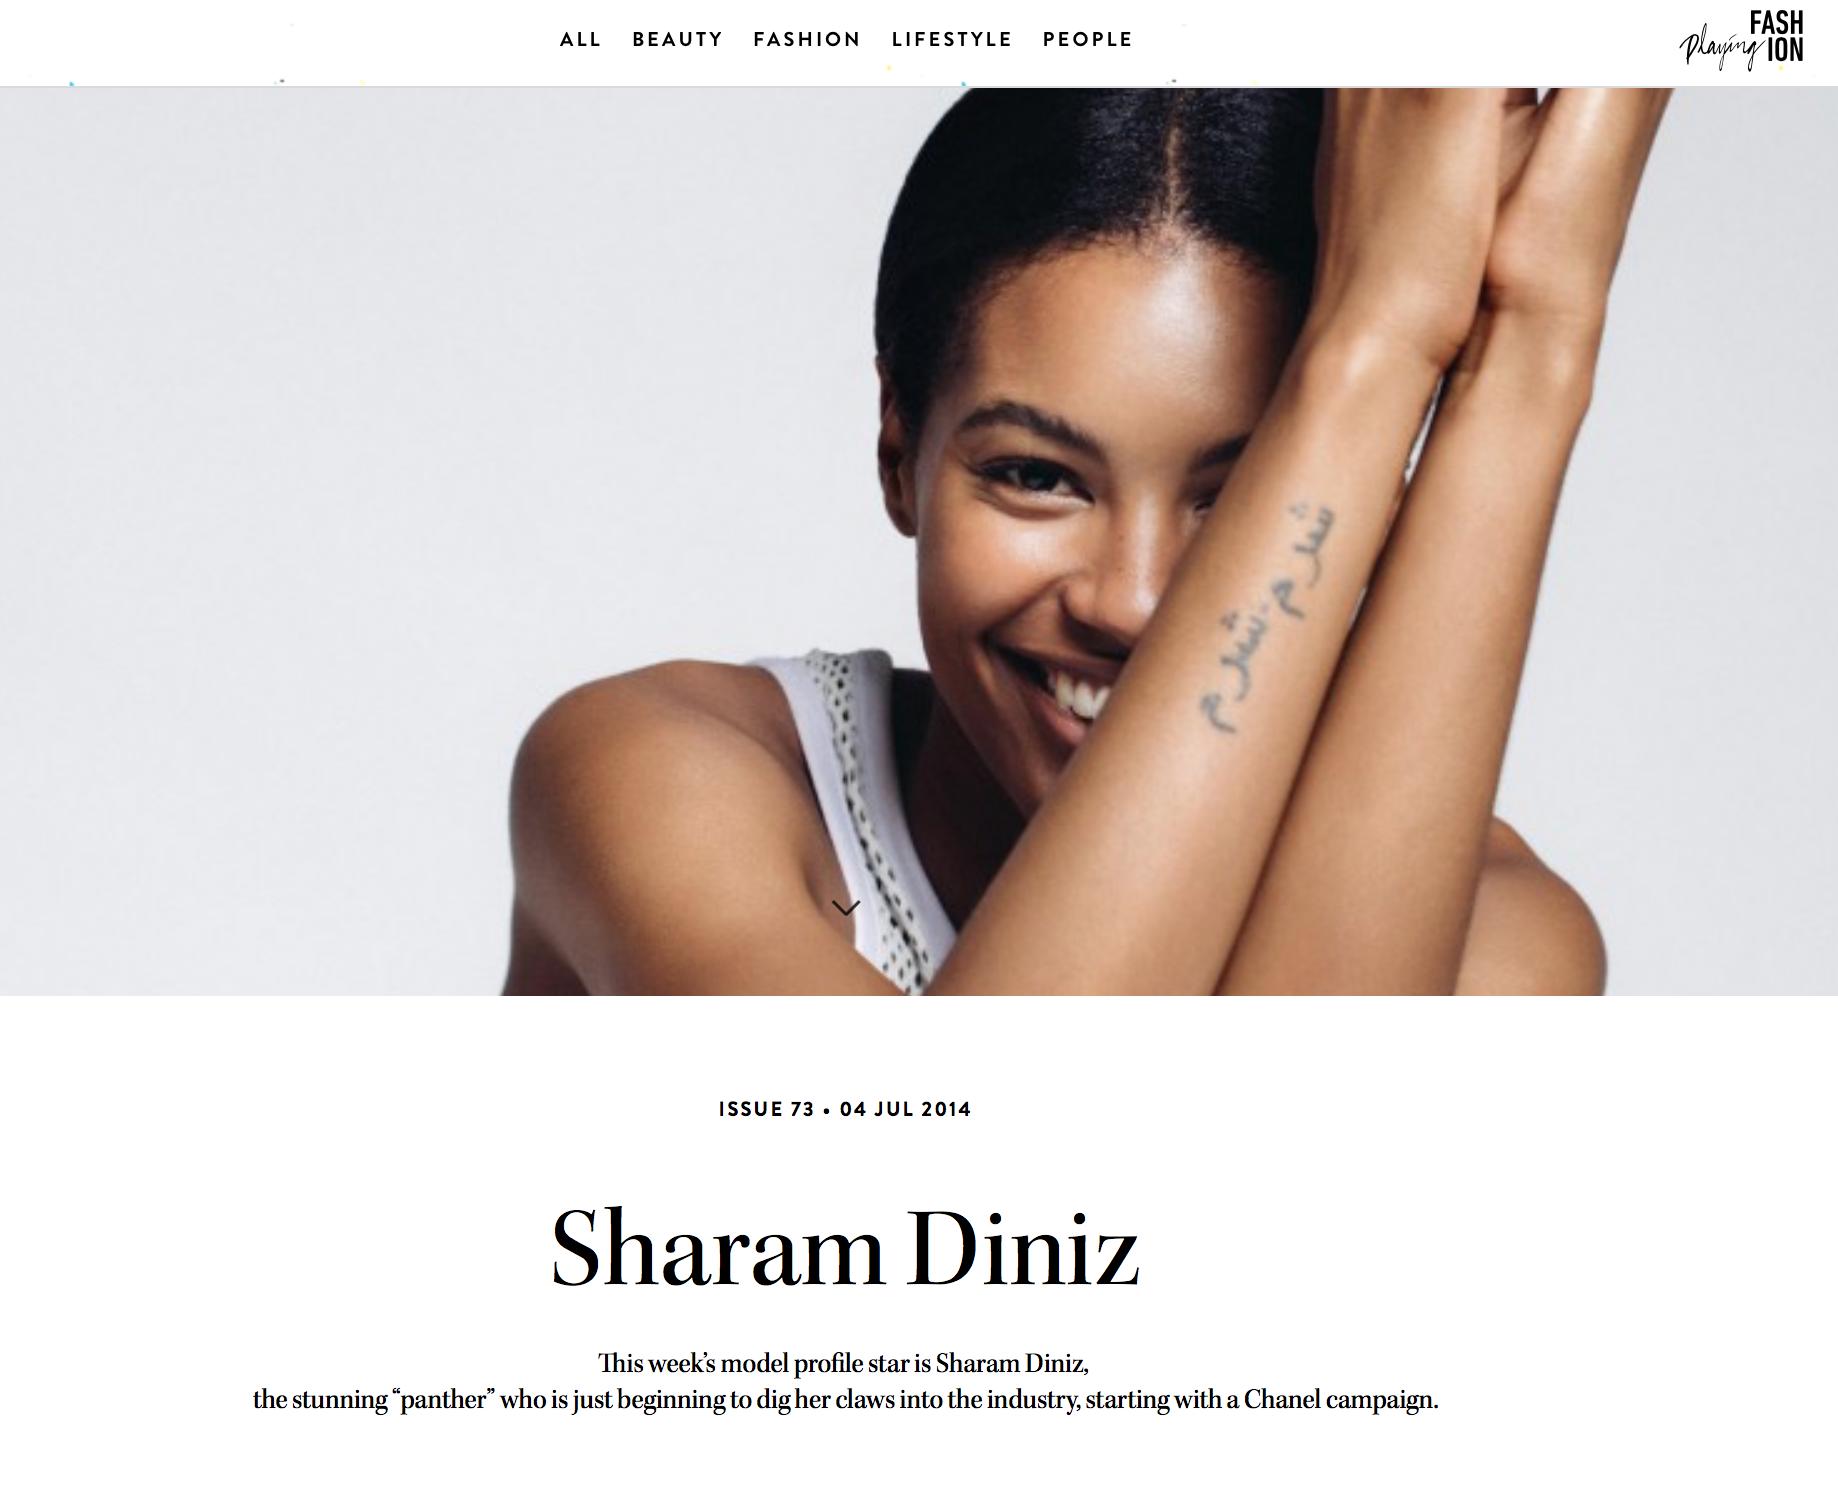 Press: Playing Fashion  Featuring: Sharam Diniz